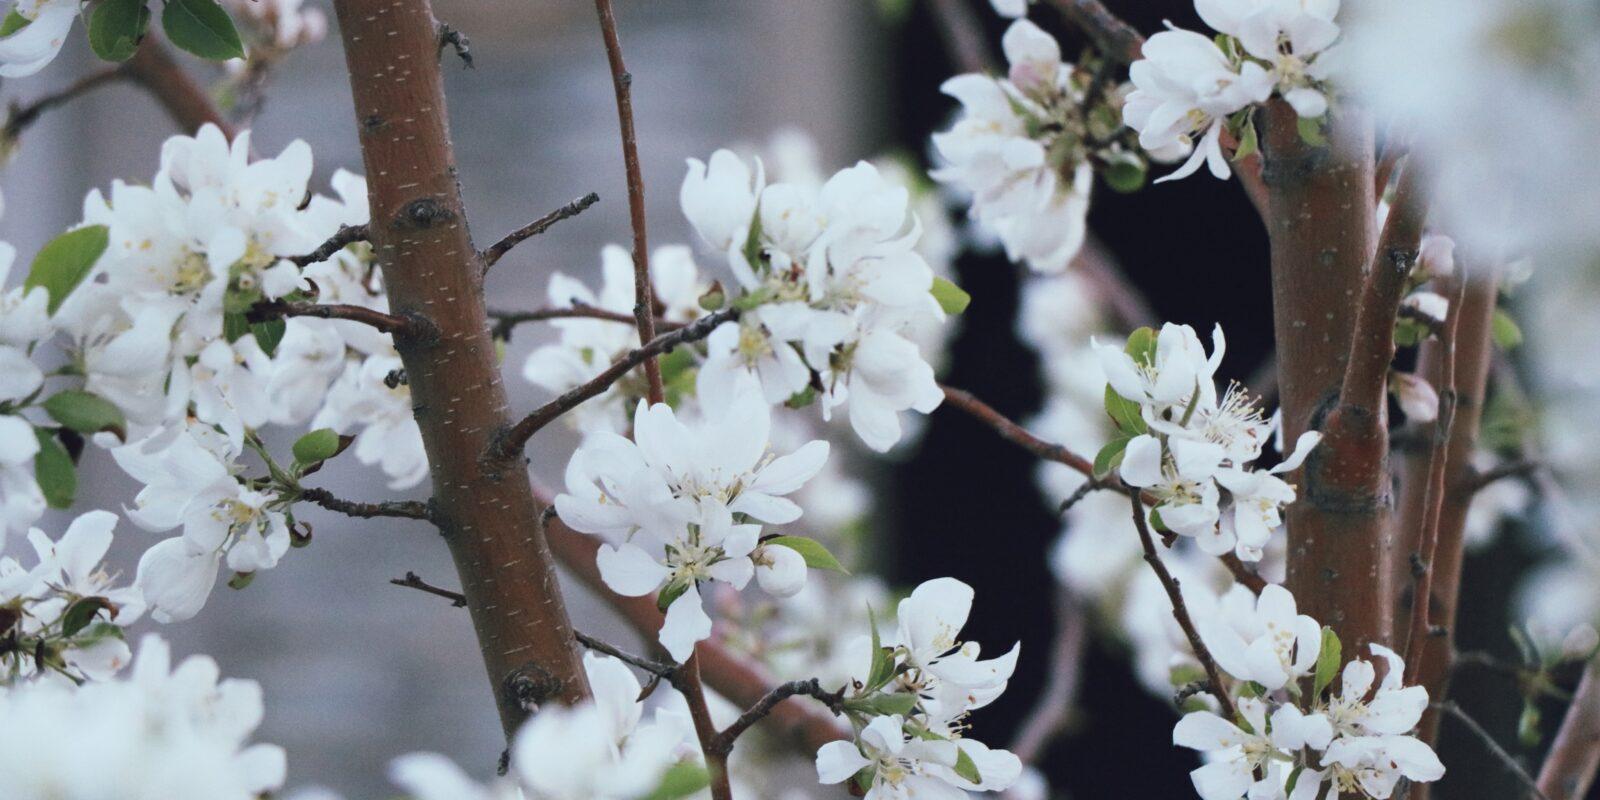 DH- Pruning